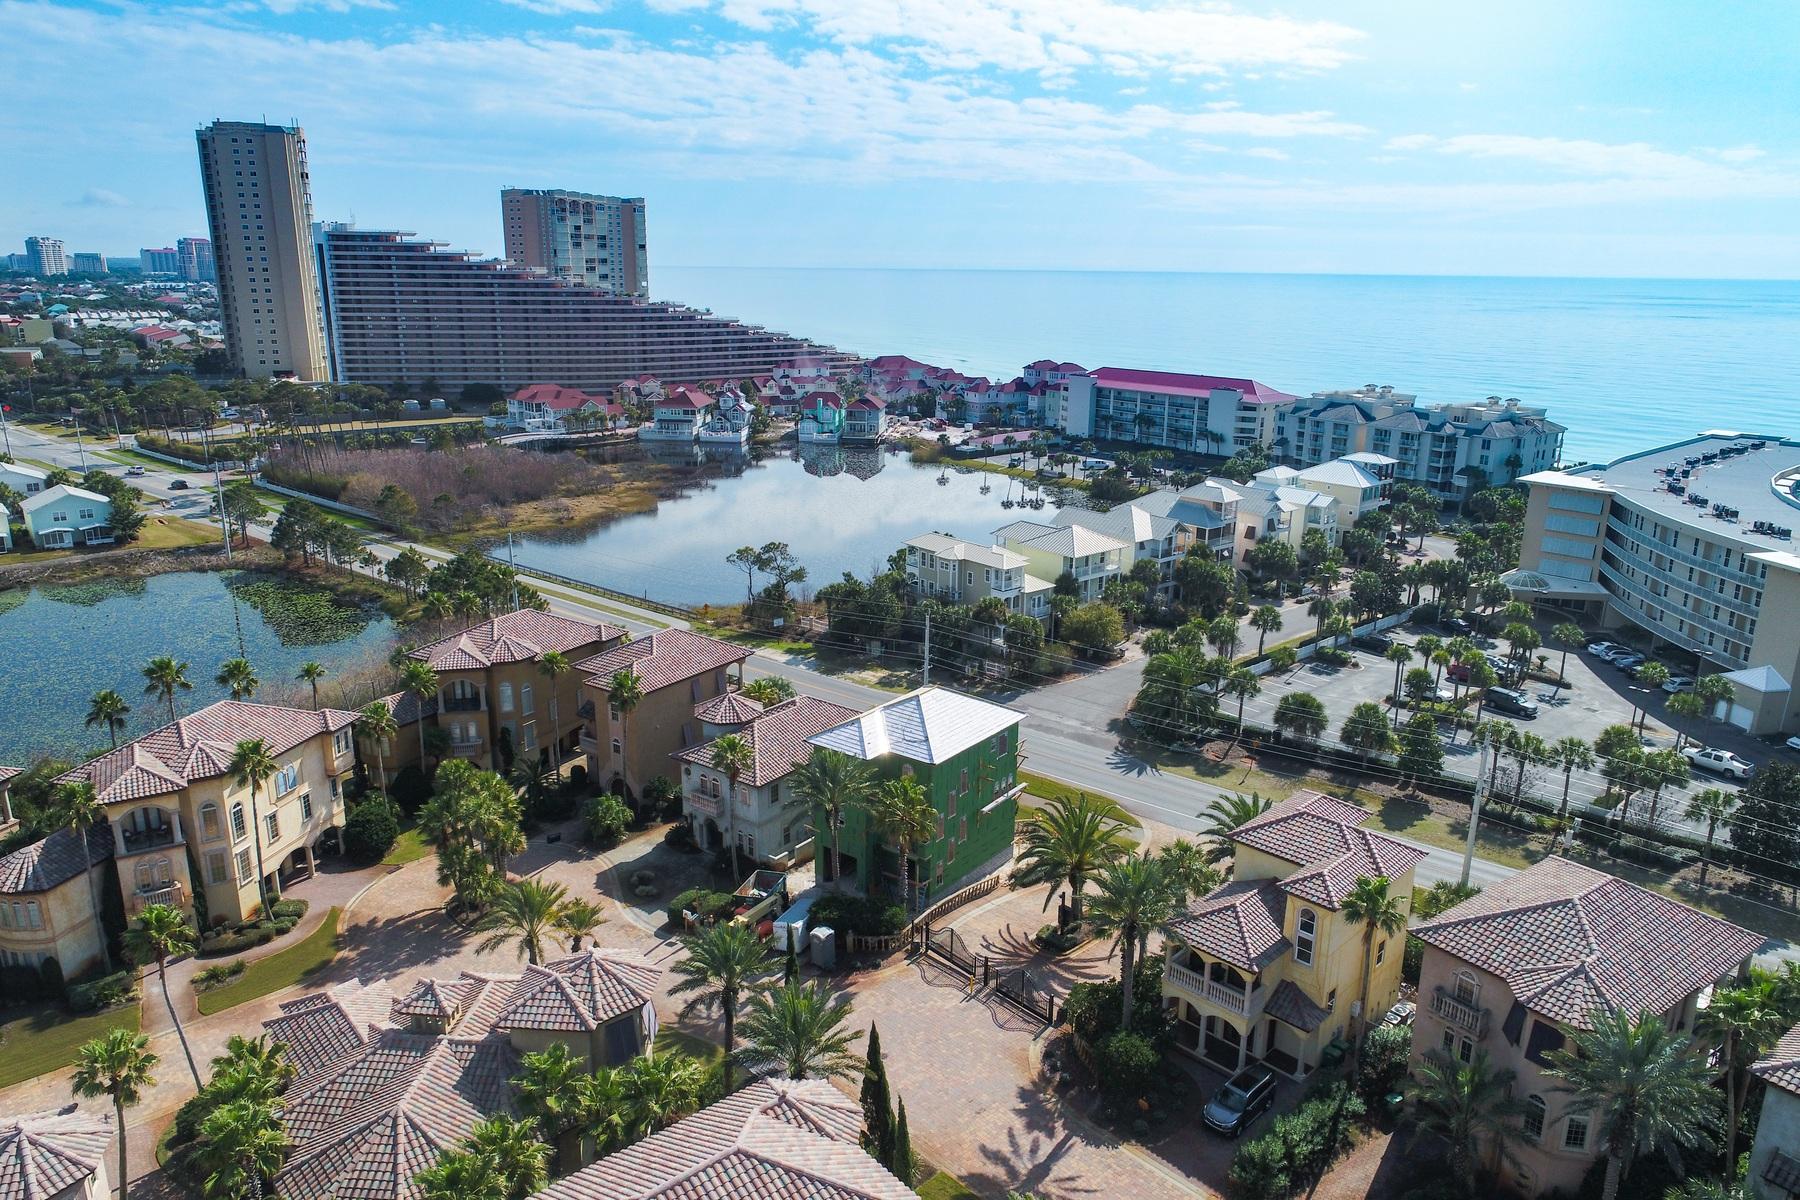 Moradia para Venda às STUNNING NEW CONSTRUCTION IN GATED MEDITERRANEAN NEIGHBORHOOD SAINT TROPEZ 231 Rue Saint Tropez Miramar Beach, Florida, 32550 Estados Unidos